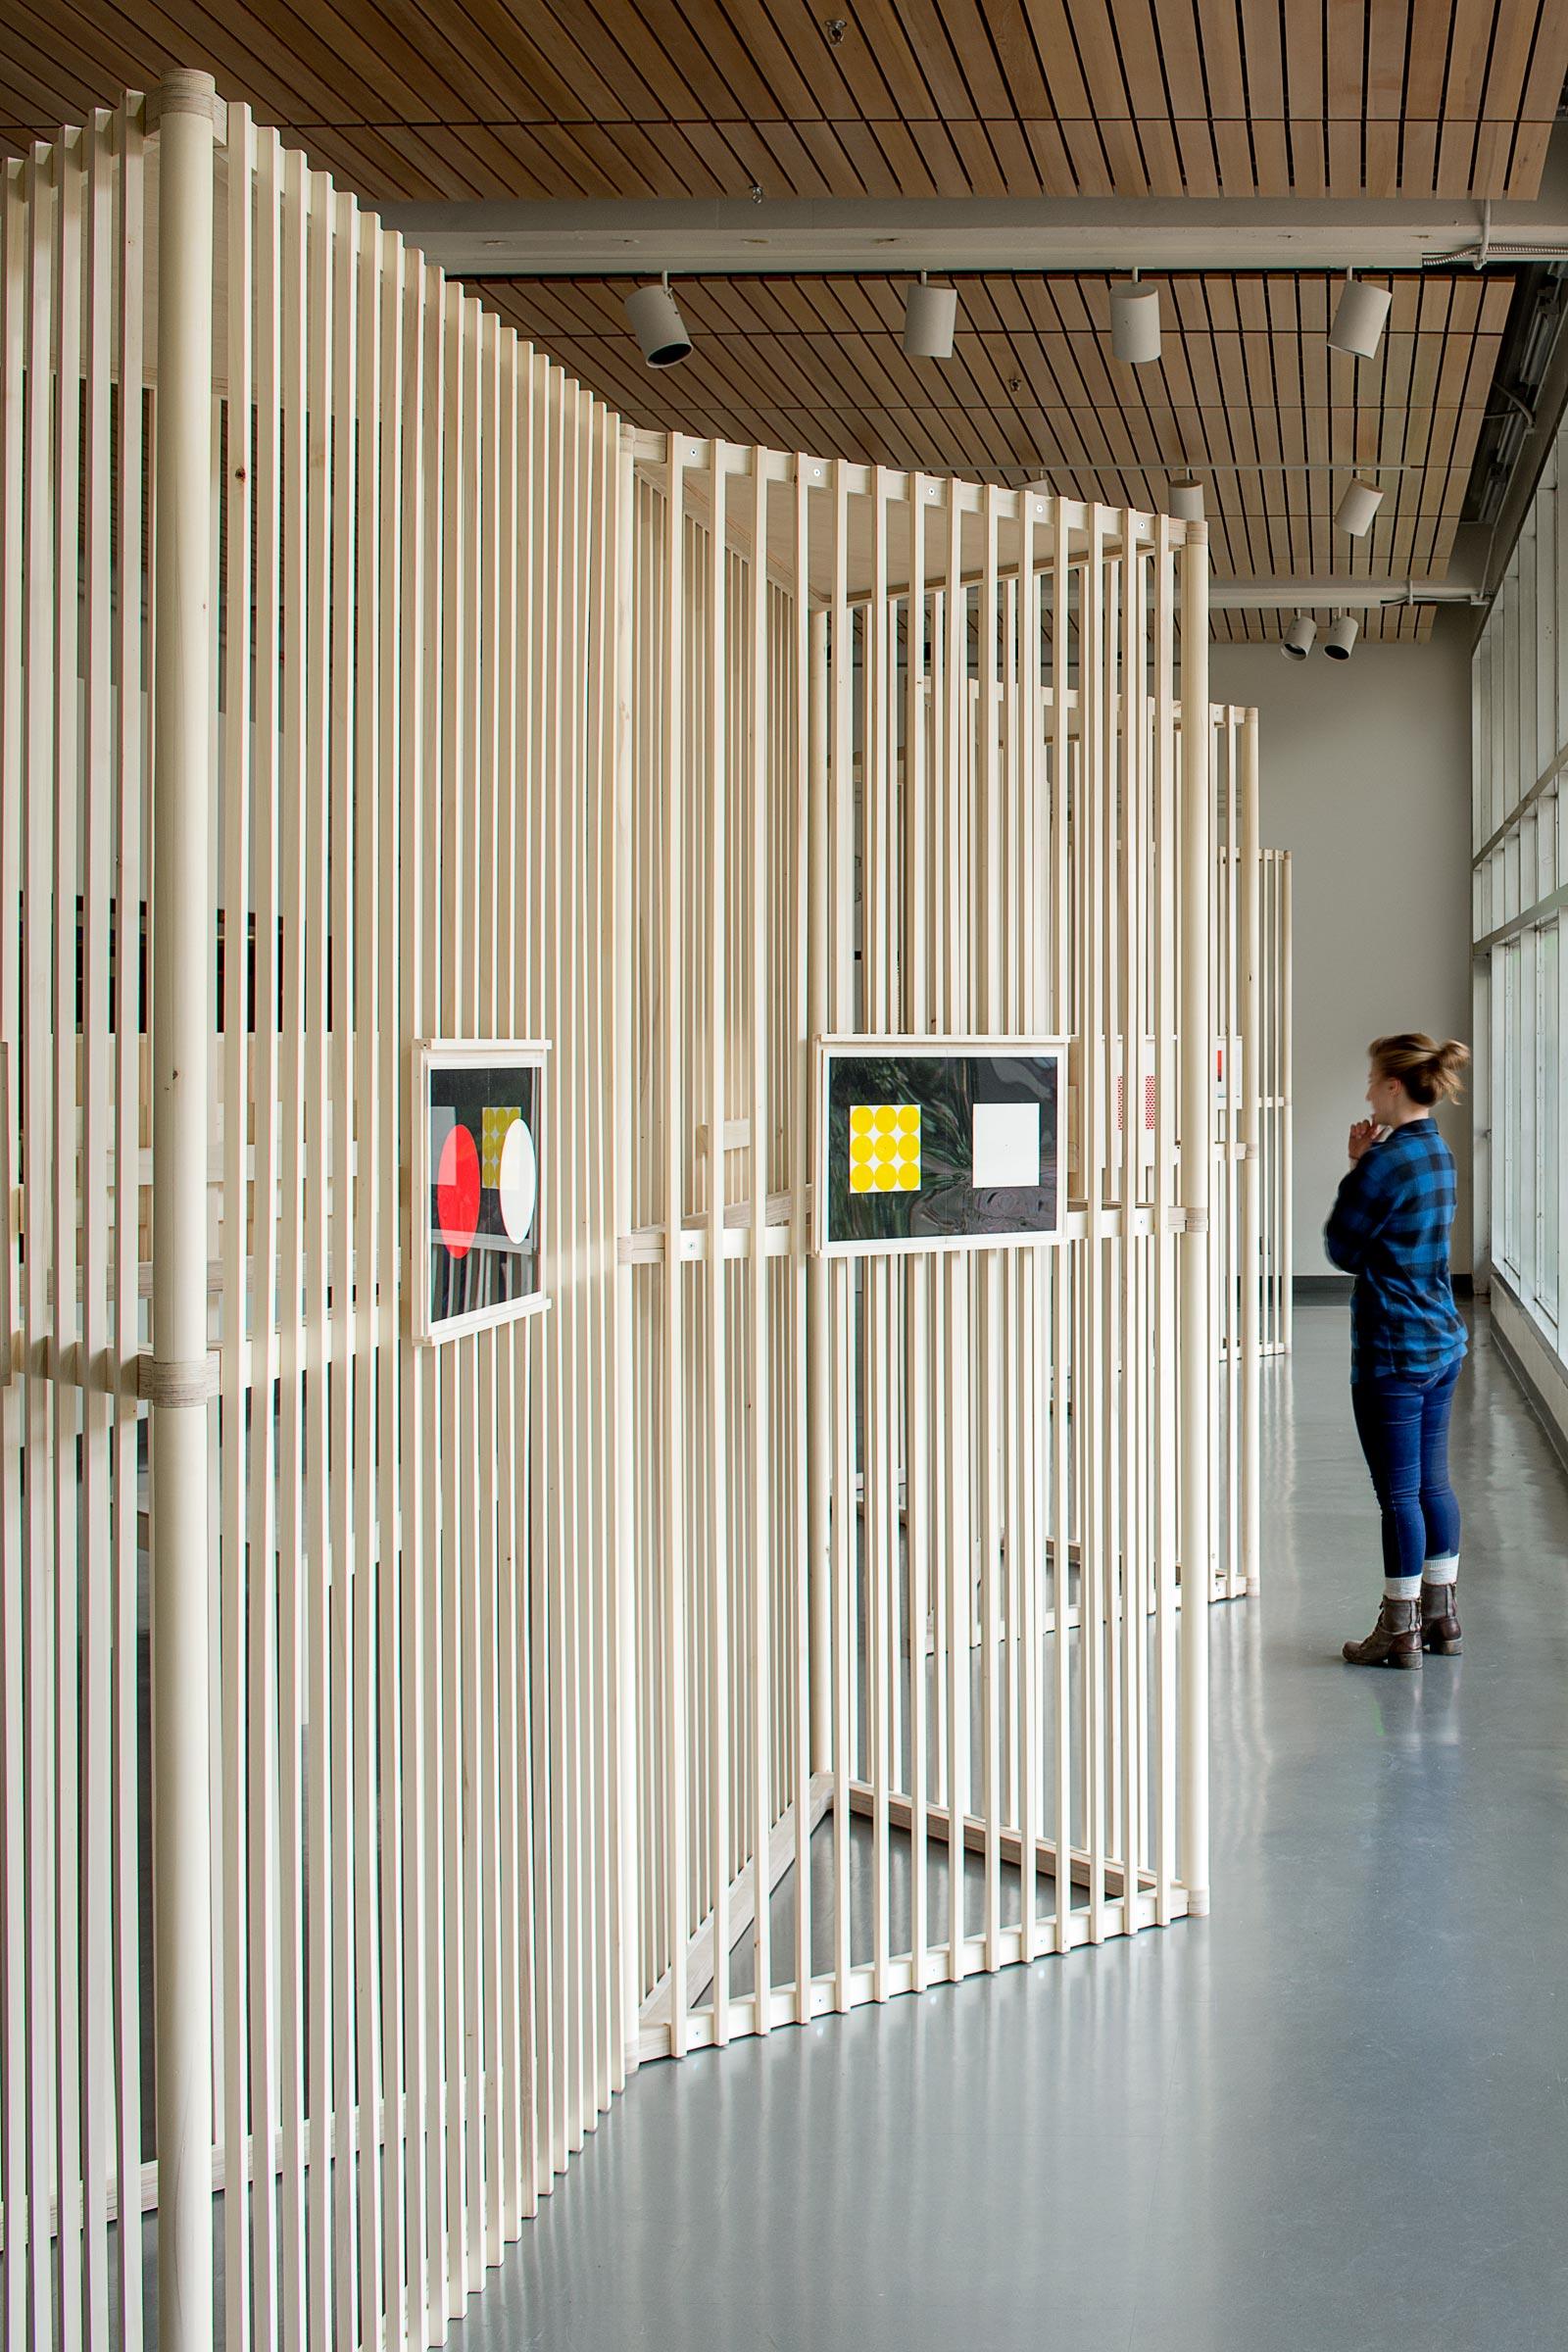 Josef Albers Exhibition. Person viewing